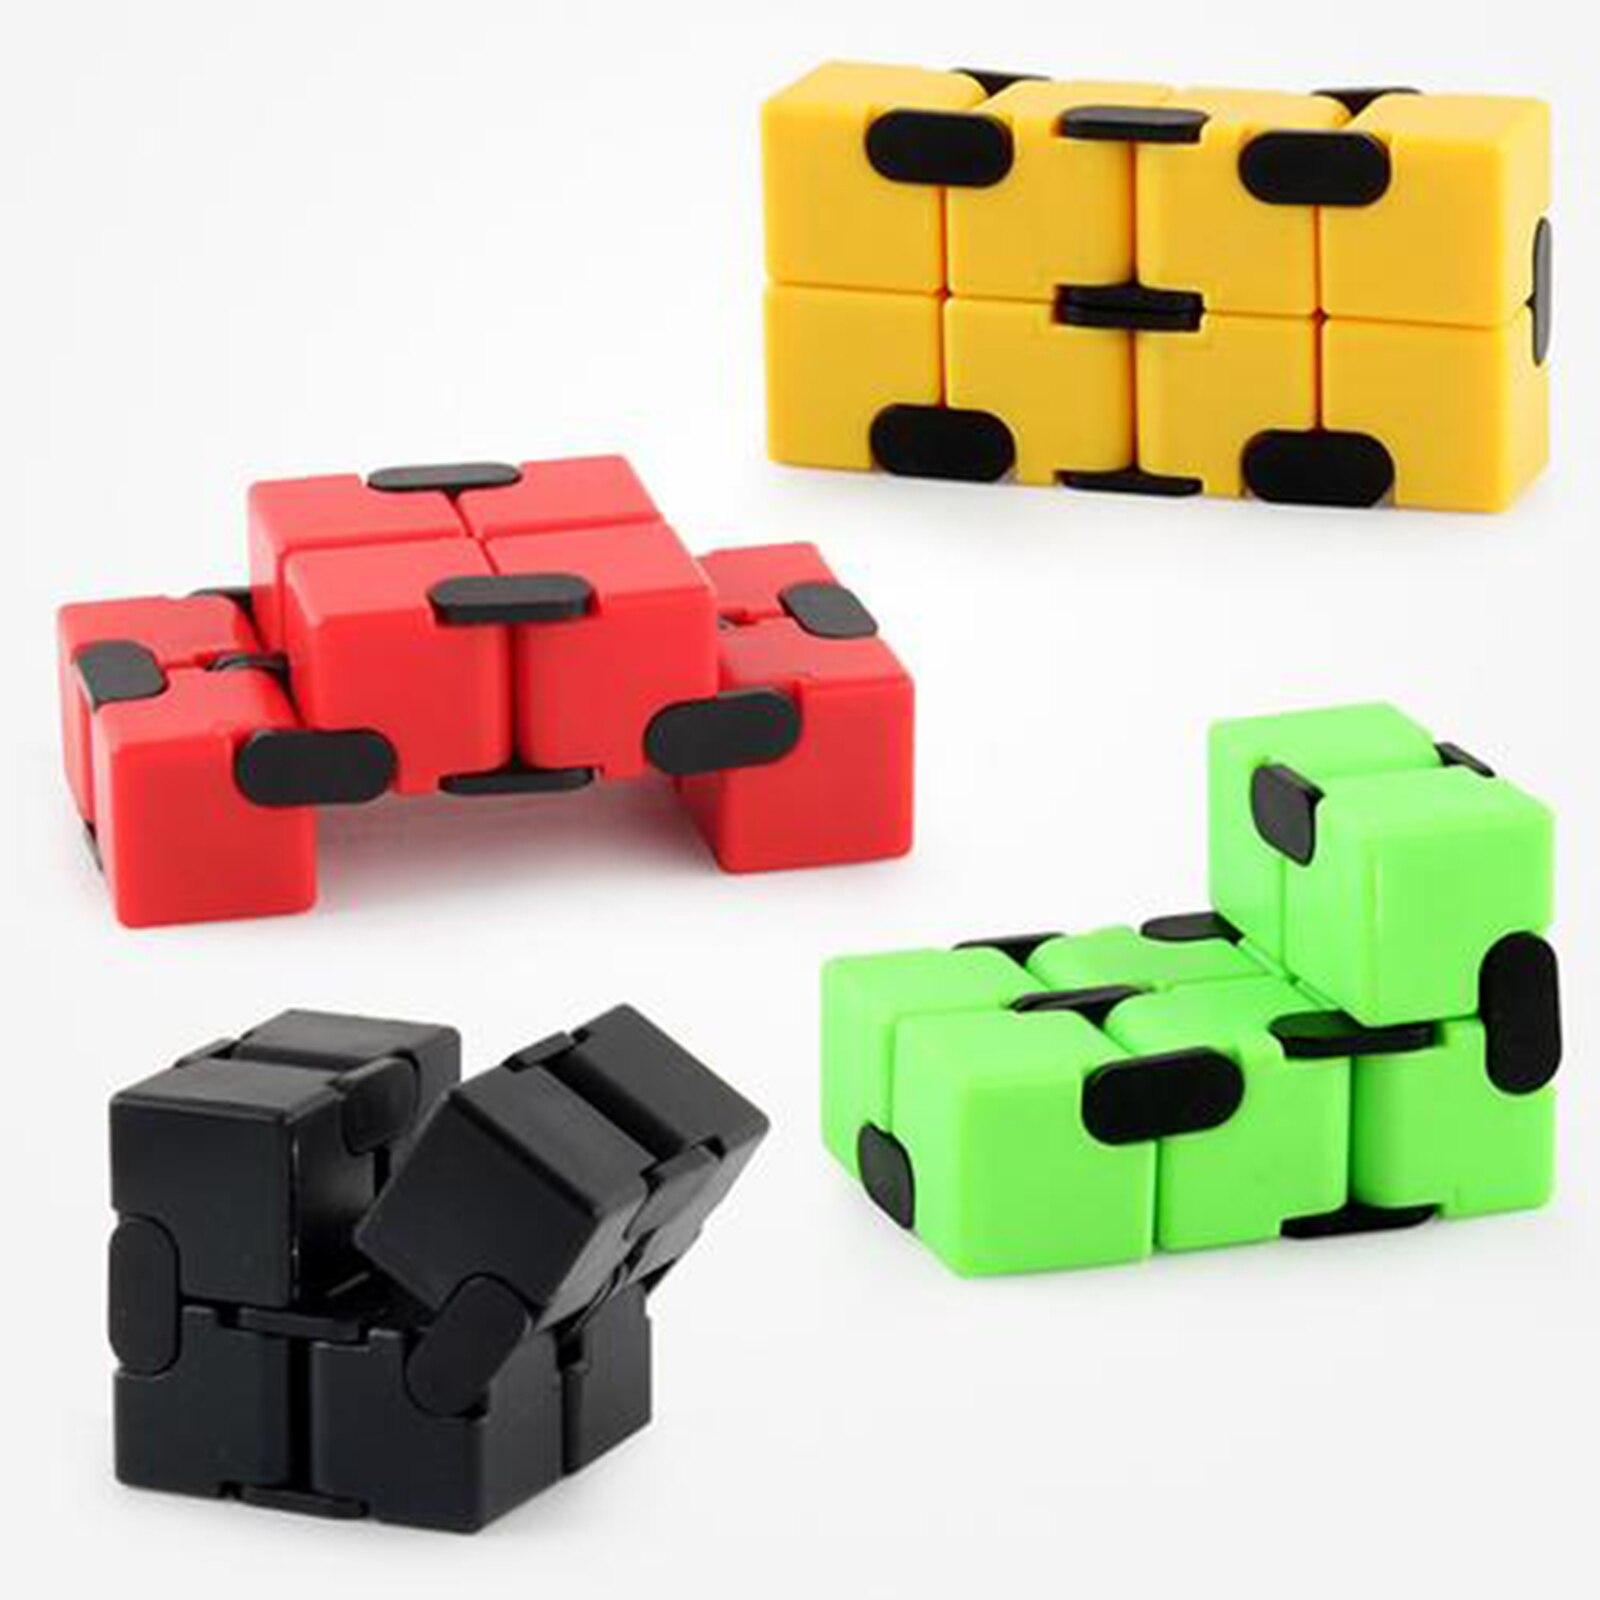 infinity cube magic square fidget toy 3132 - Wacky Track